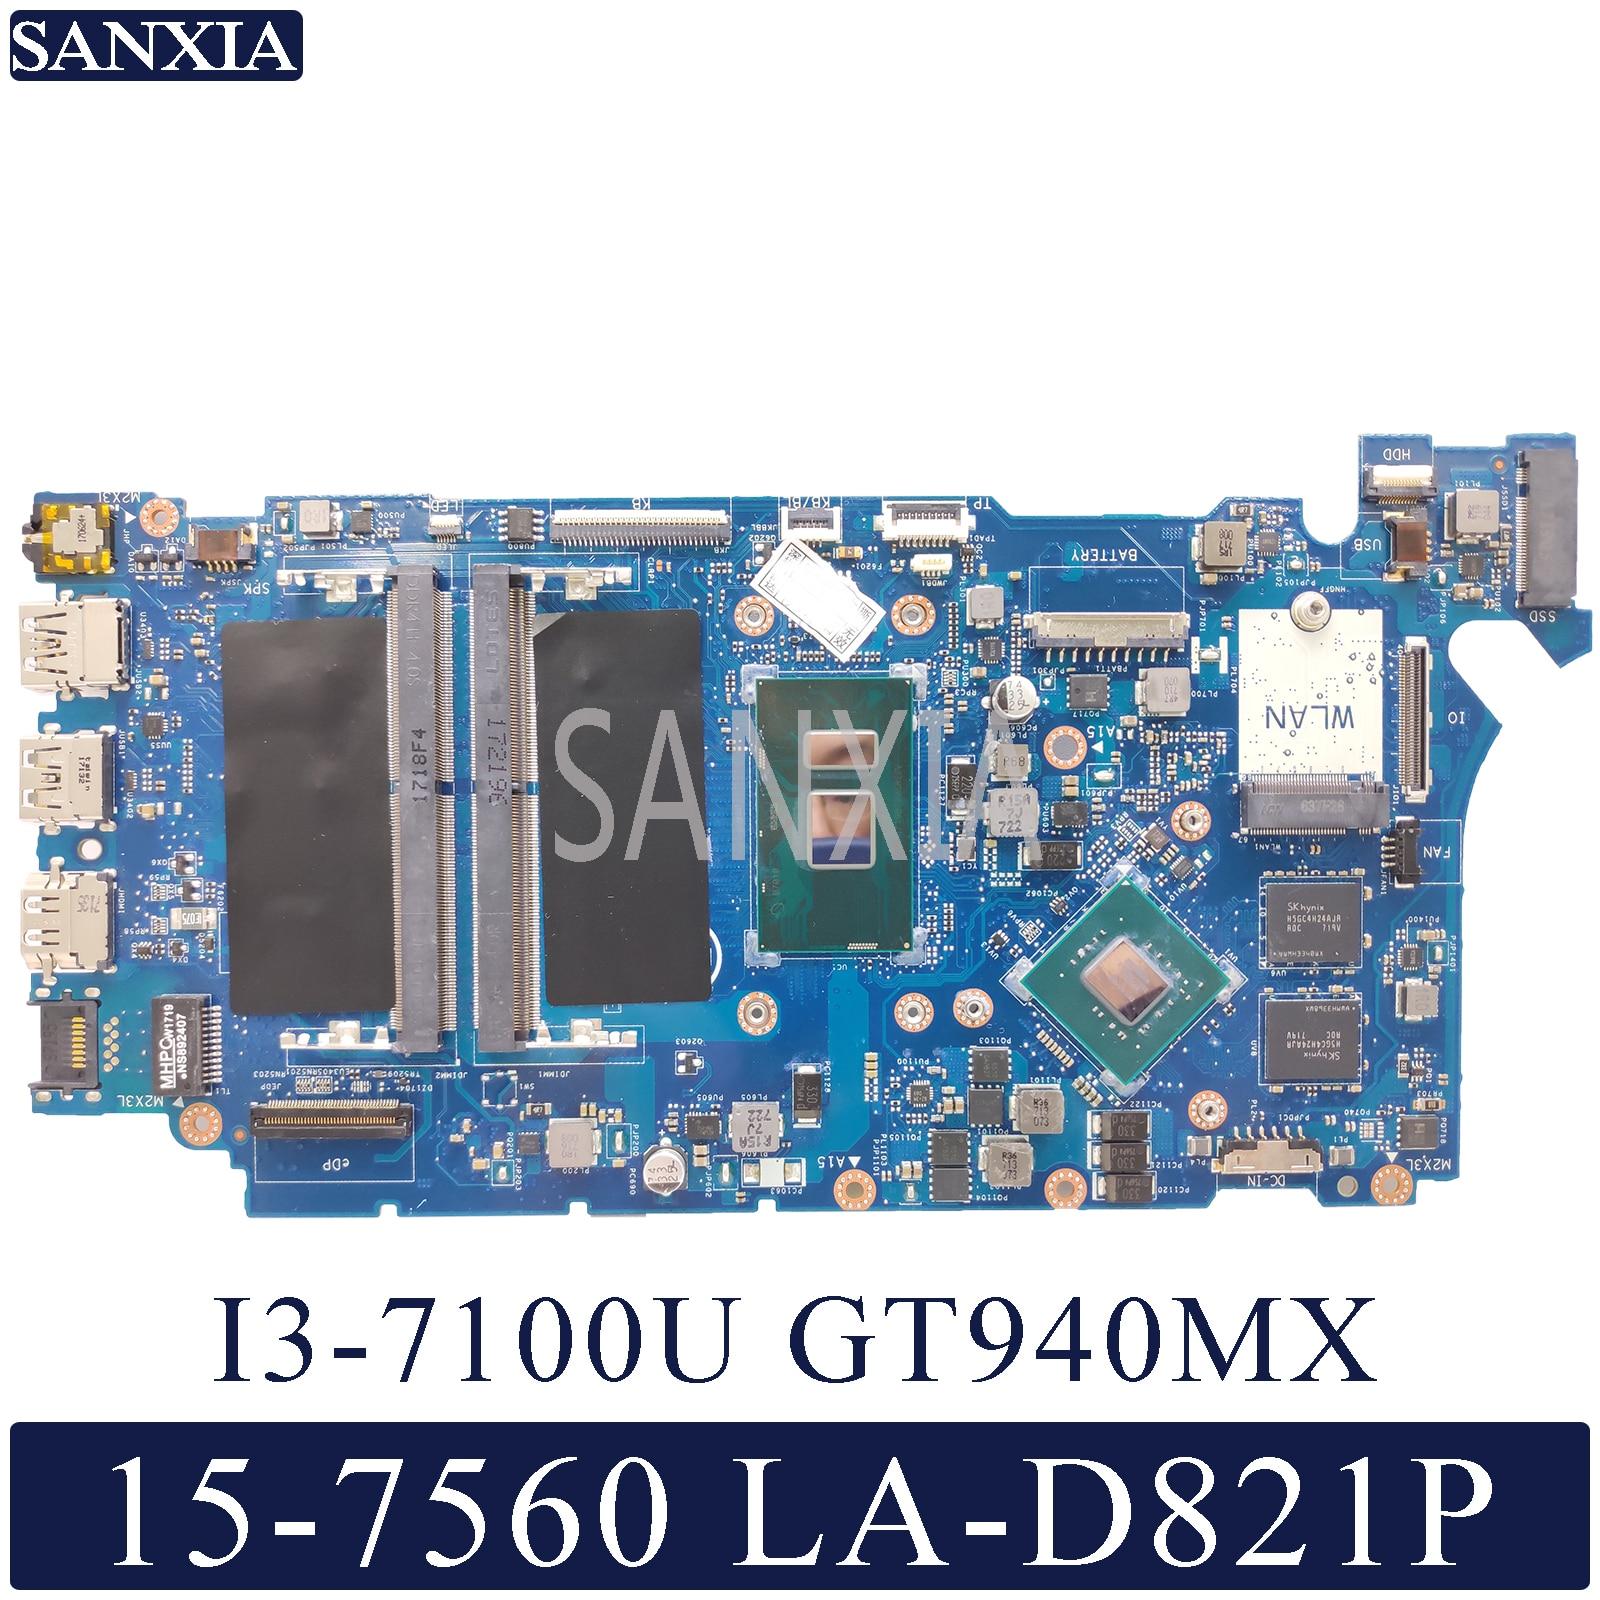 KEFU LA-D821P Laptop Motherboard For Dell Inspiron 15-7560 14-7460 Original Mainboard I3-7100U GT940M